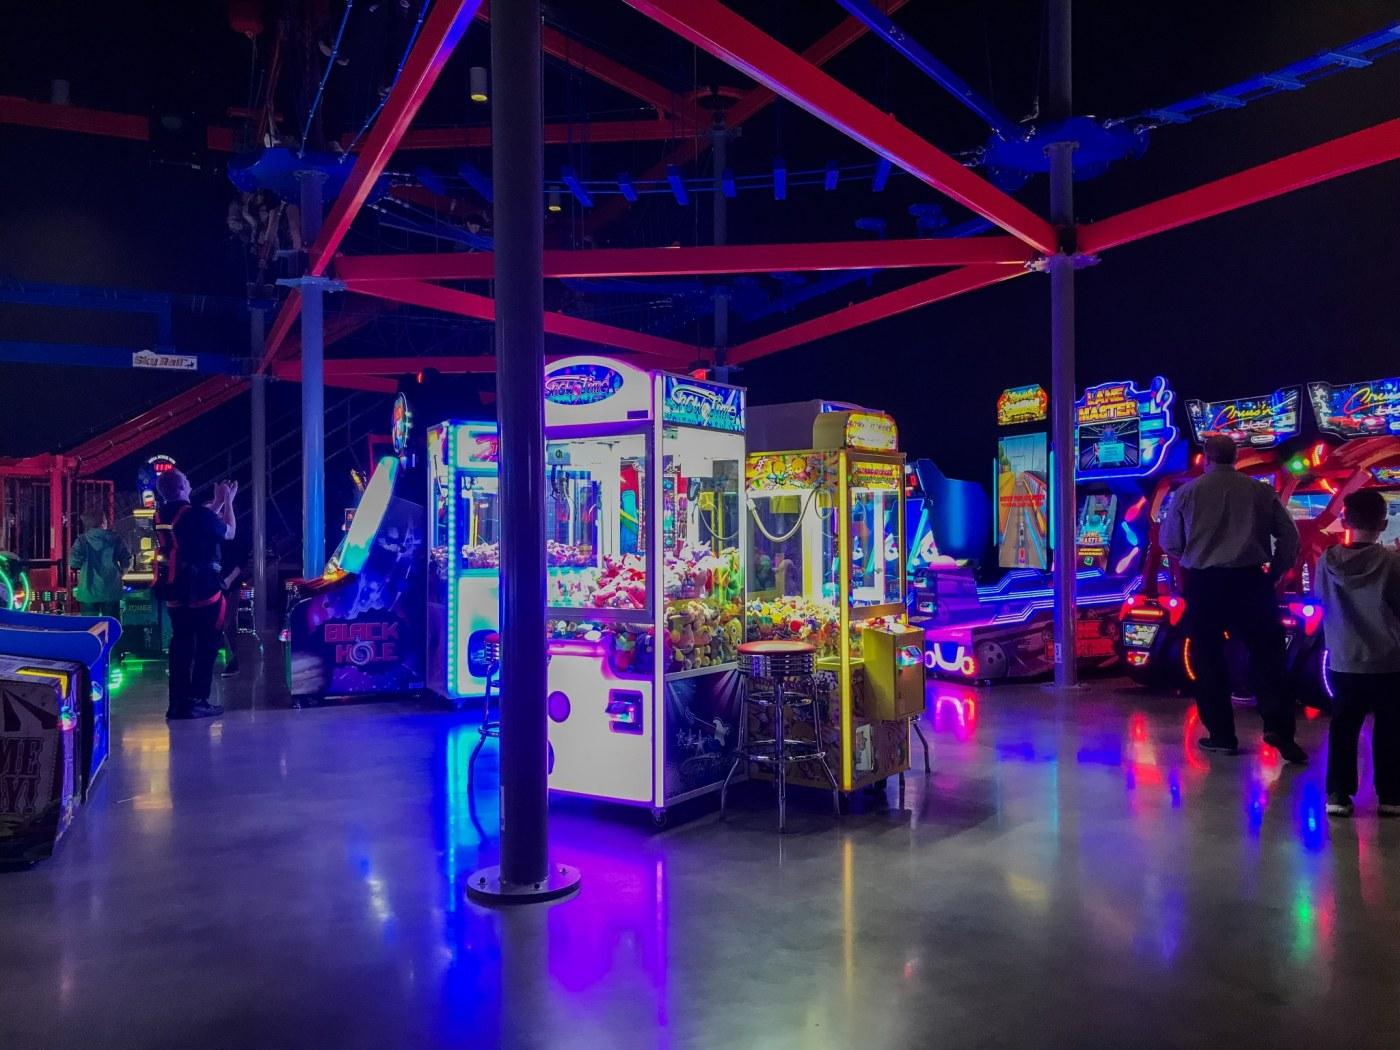 Birmingham, Alabama, Pell City Premiere Lux Cine, arcade